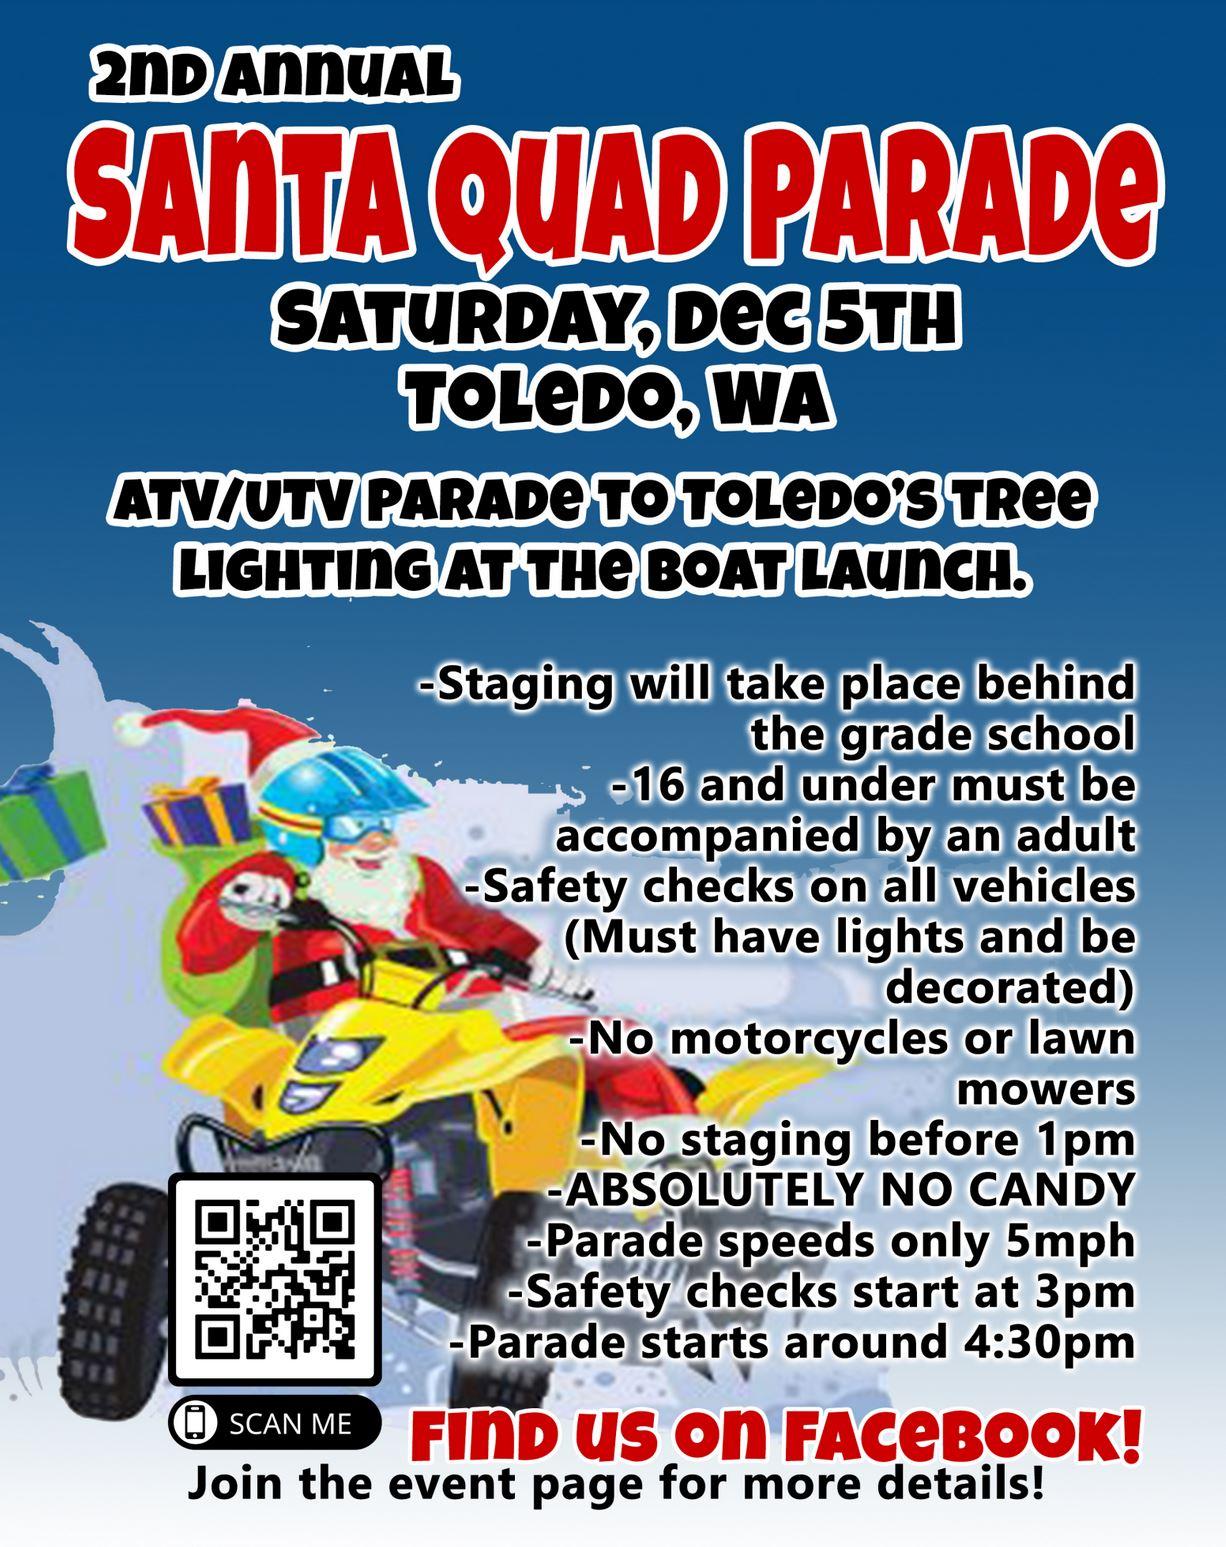 Santa Quad Parade Flier for parade in Toledo, WA on December 5th, 2020